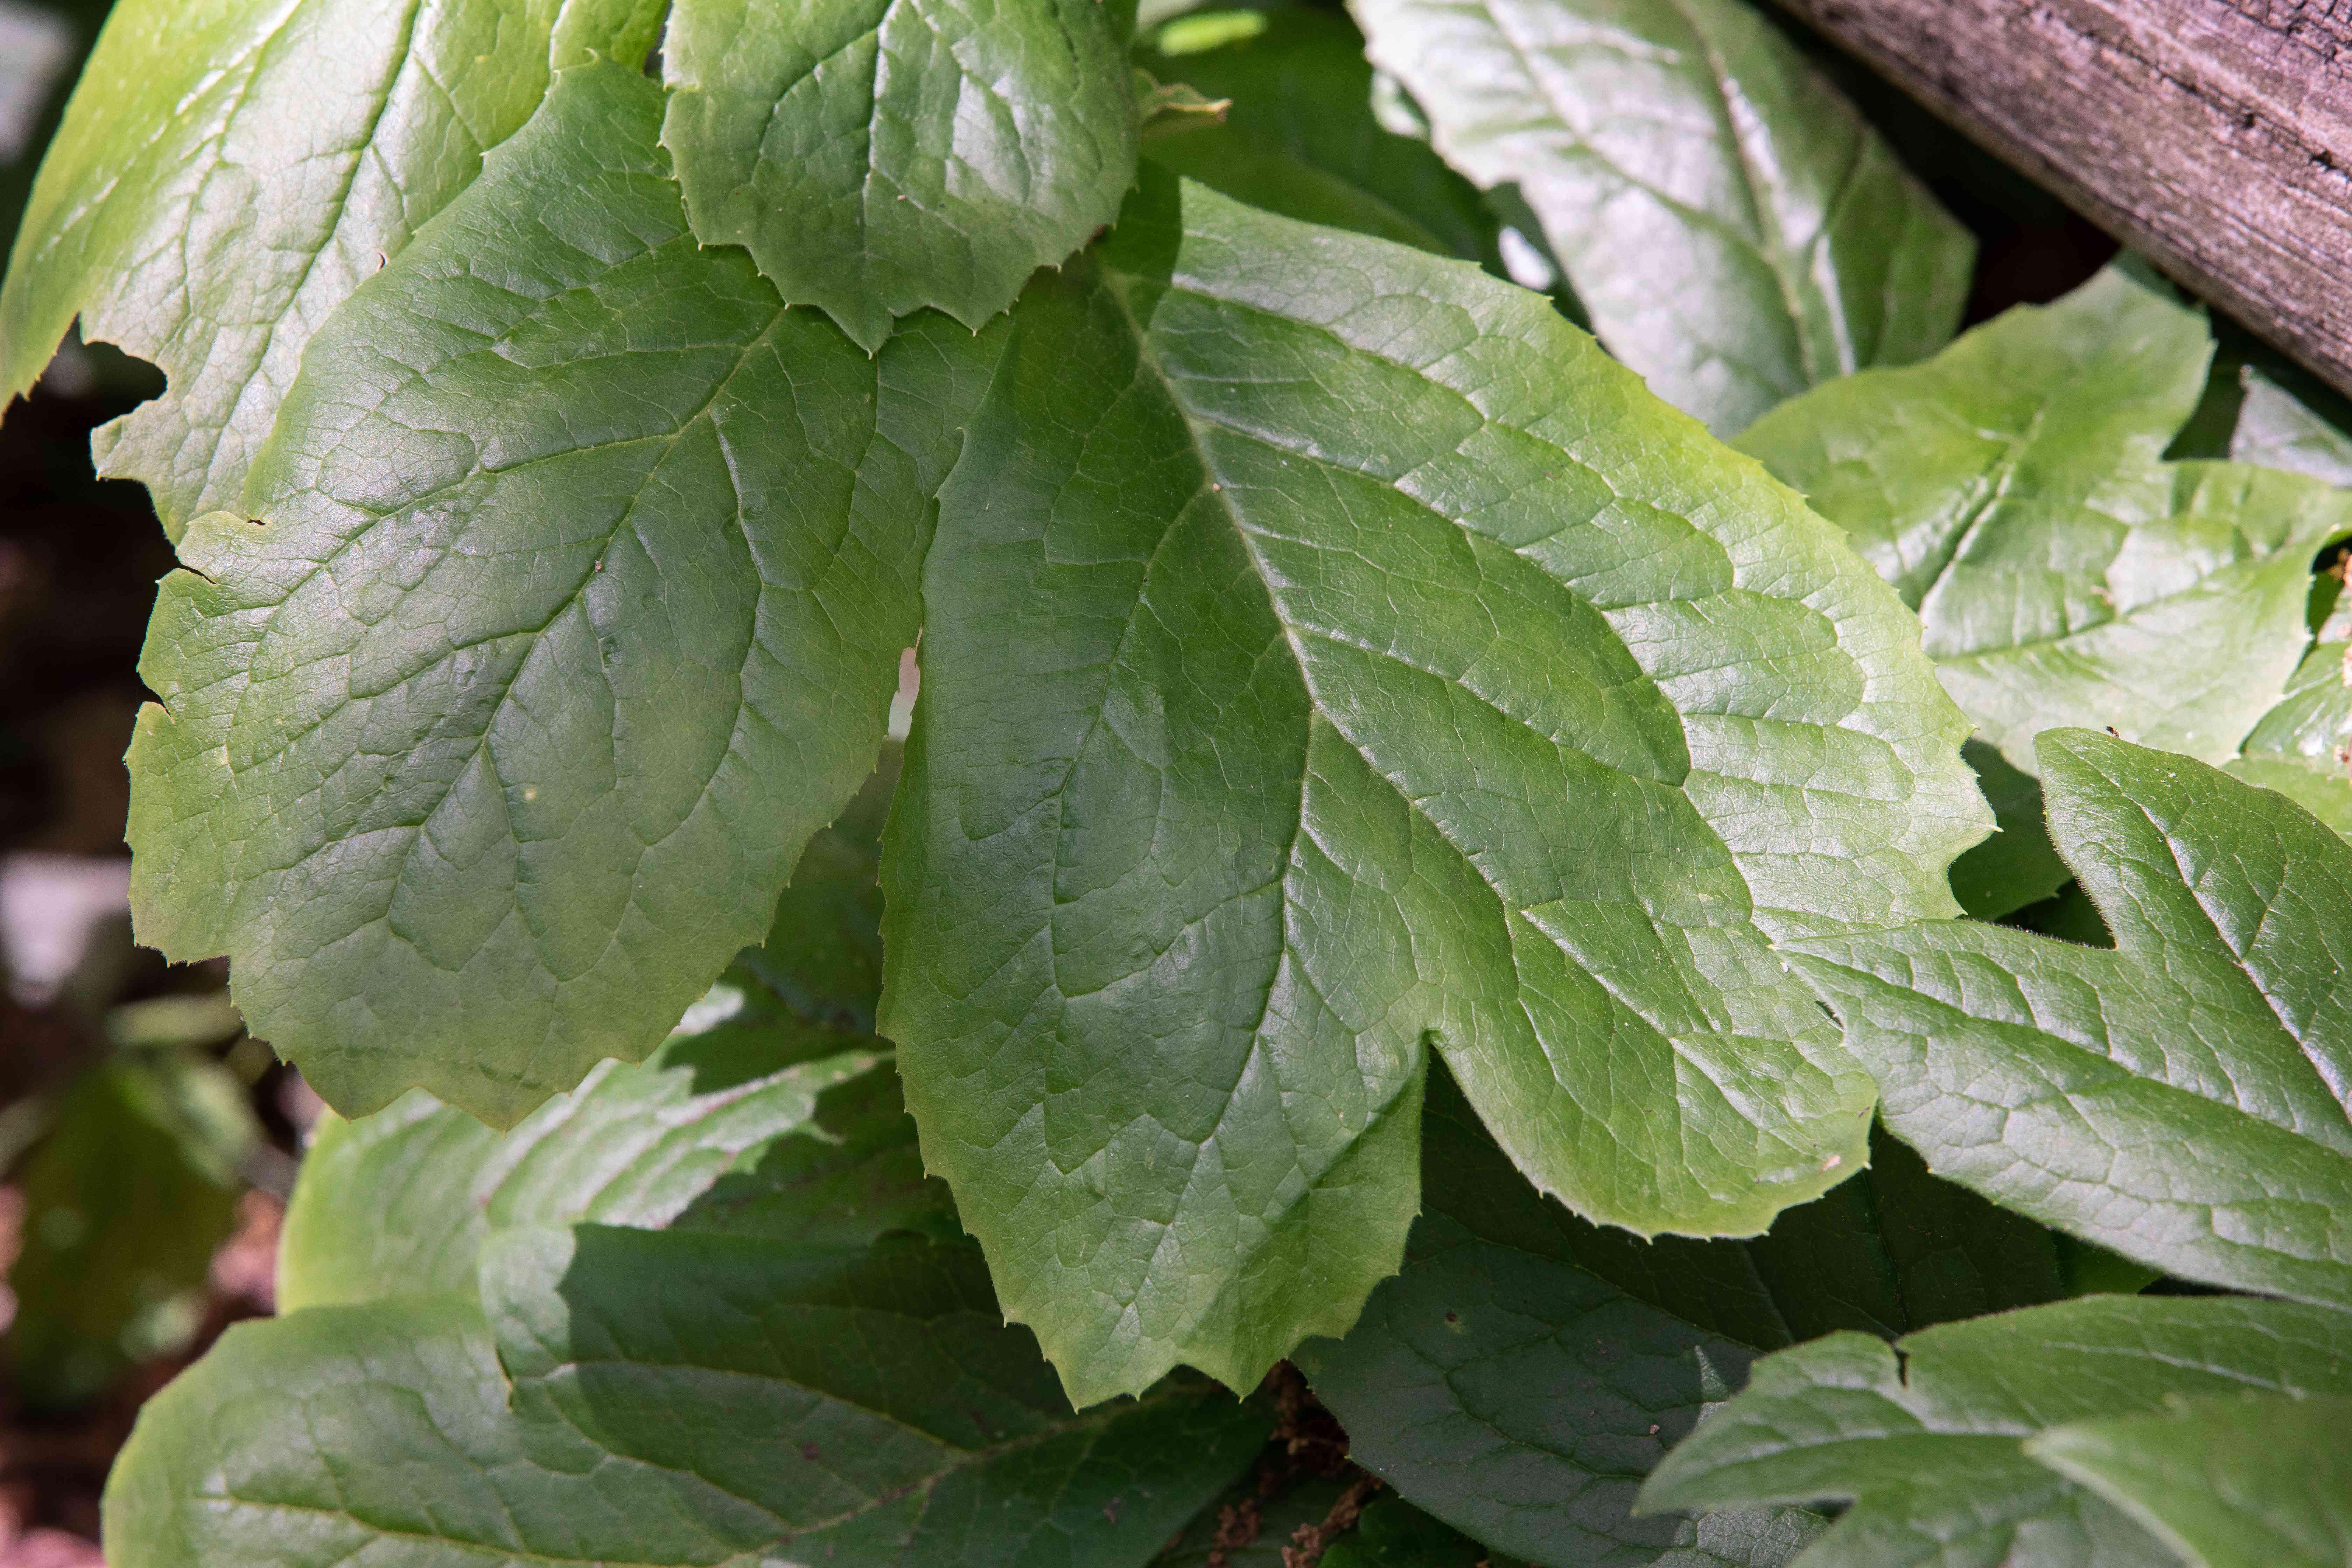 Mayapple wildflower plant with divided umbrella-like leaves closeup